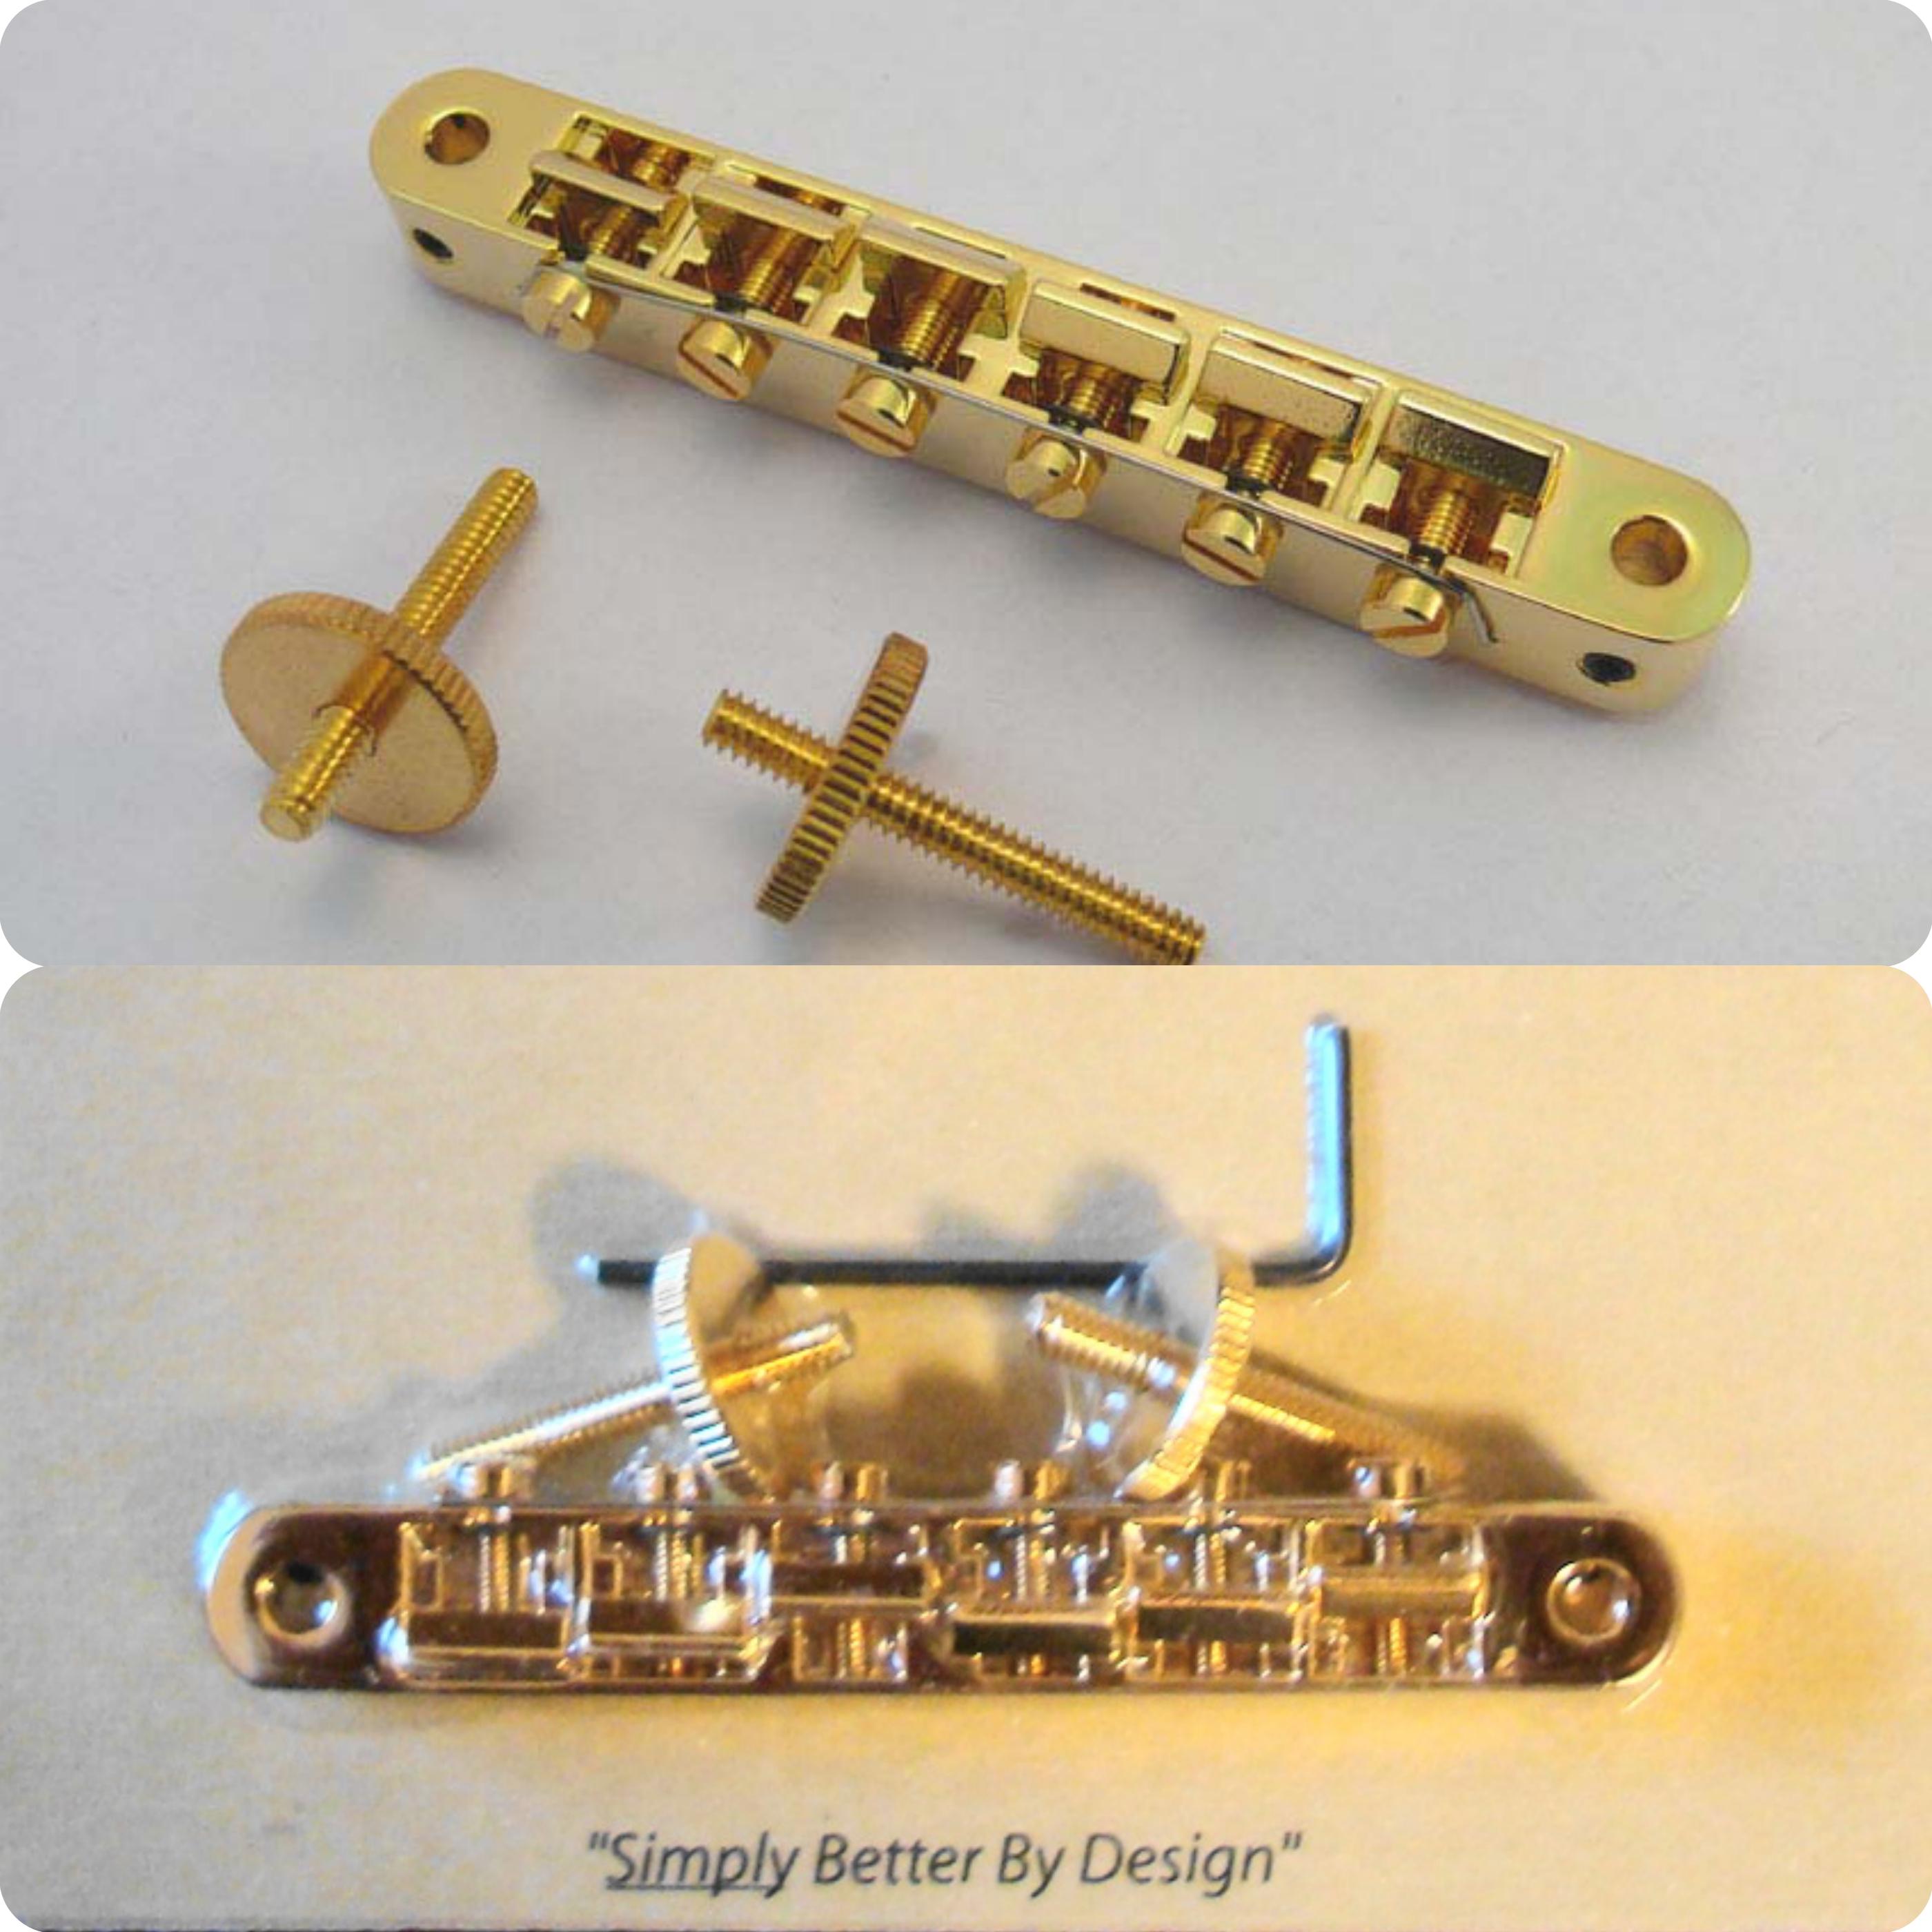 AVR2-G TonePros ABR1 Replacement Tune-O-Matic Bridge Gold Finish